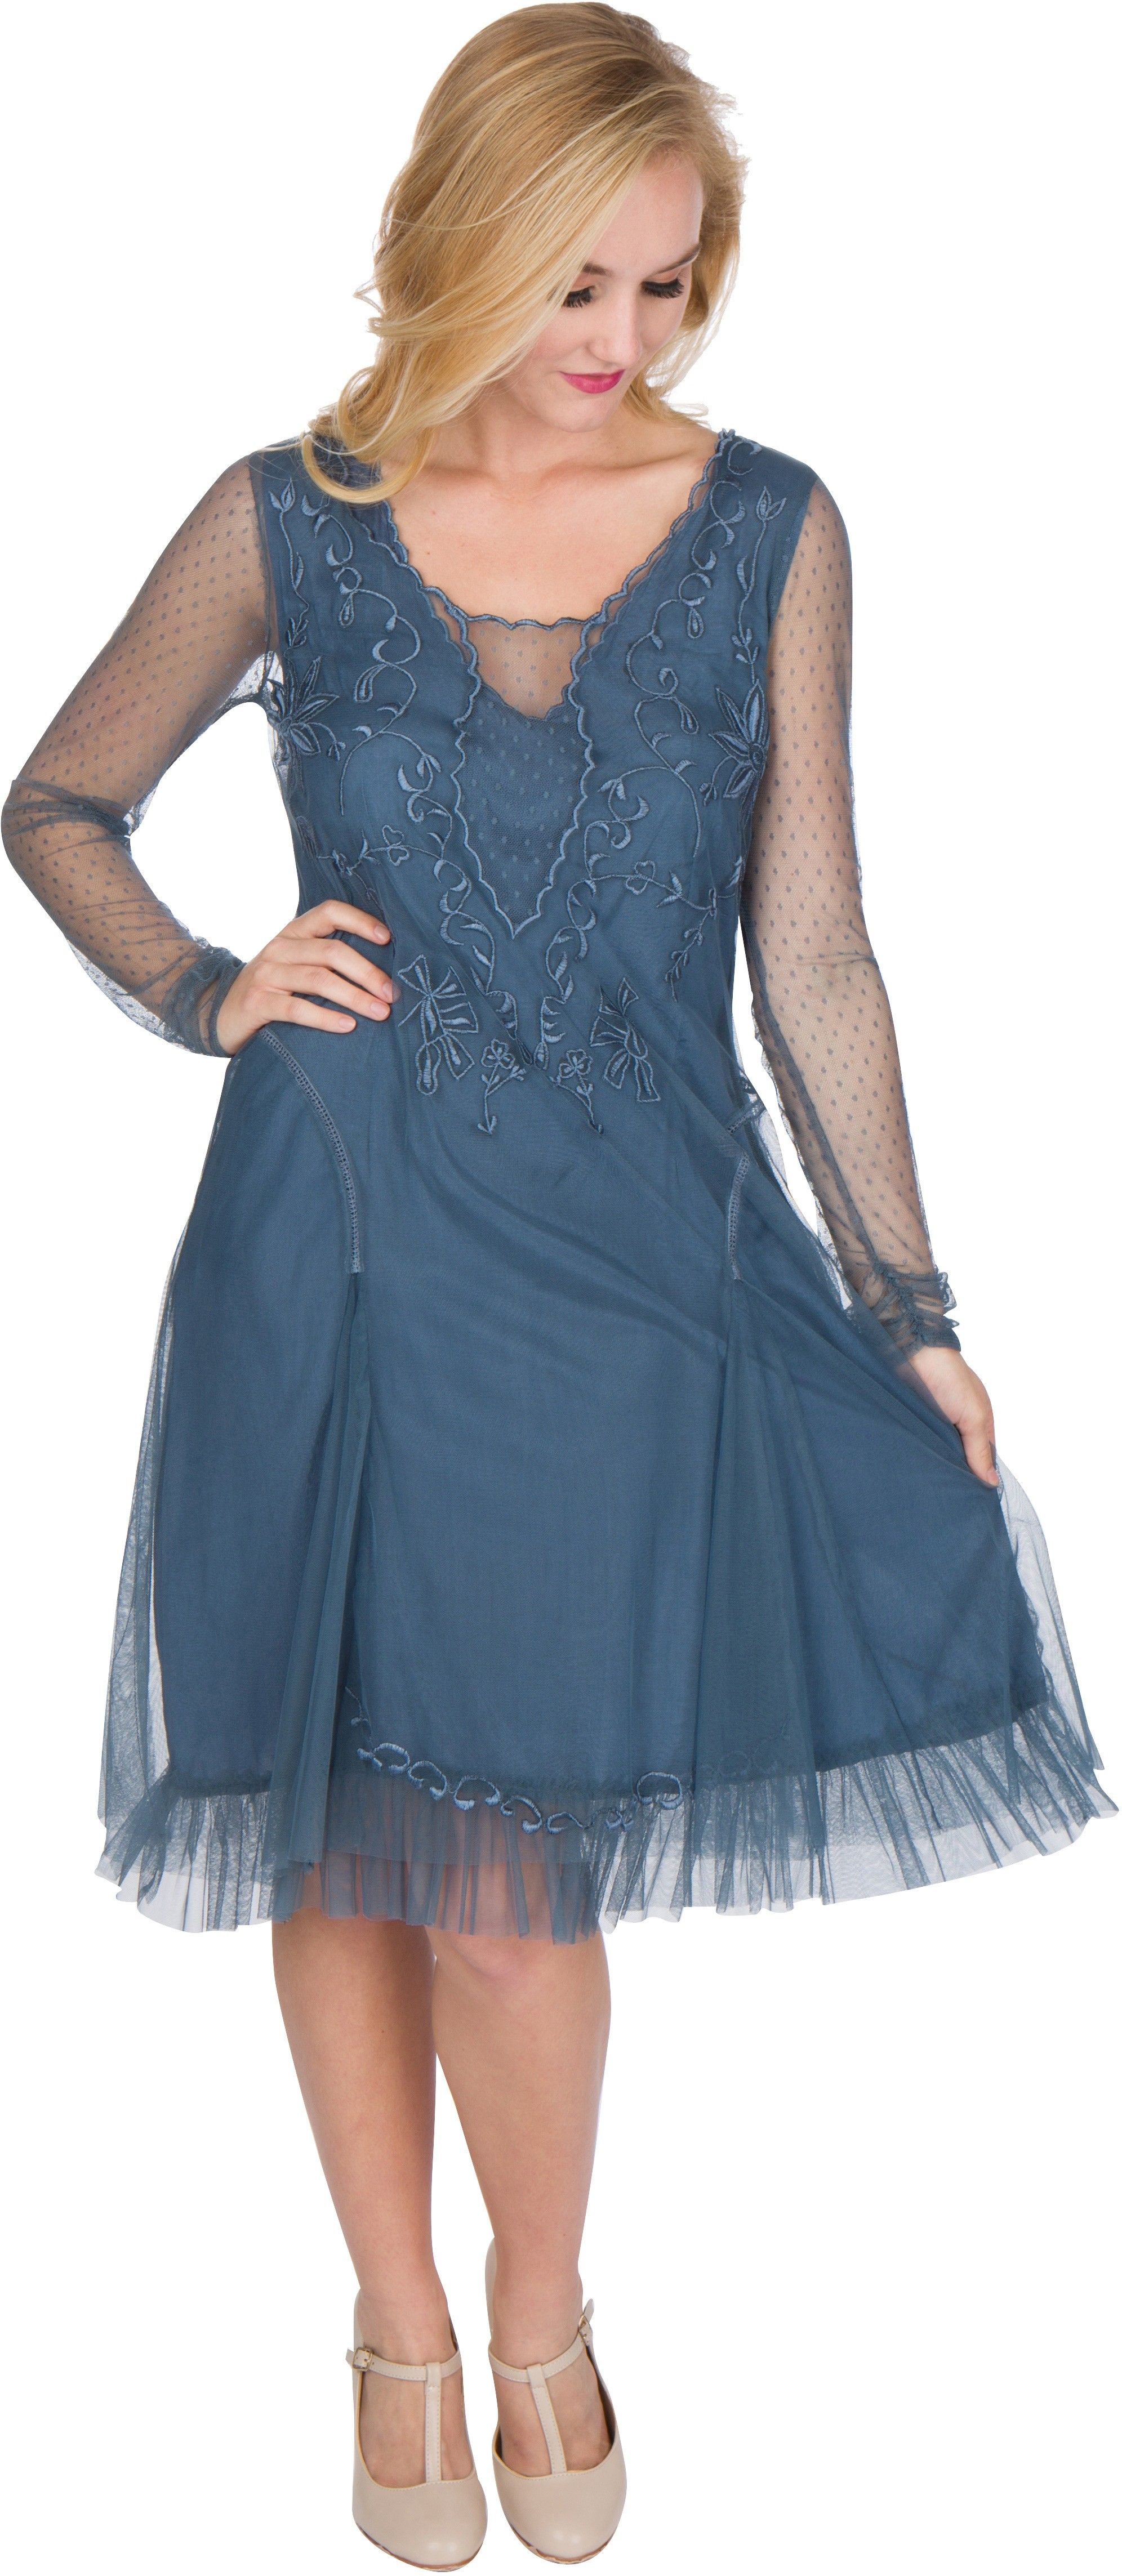 1920s Day Dresses, Tea Dresses, Garden Party Dresses | Serenity ...